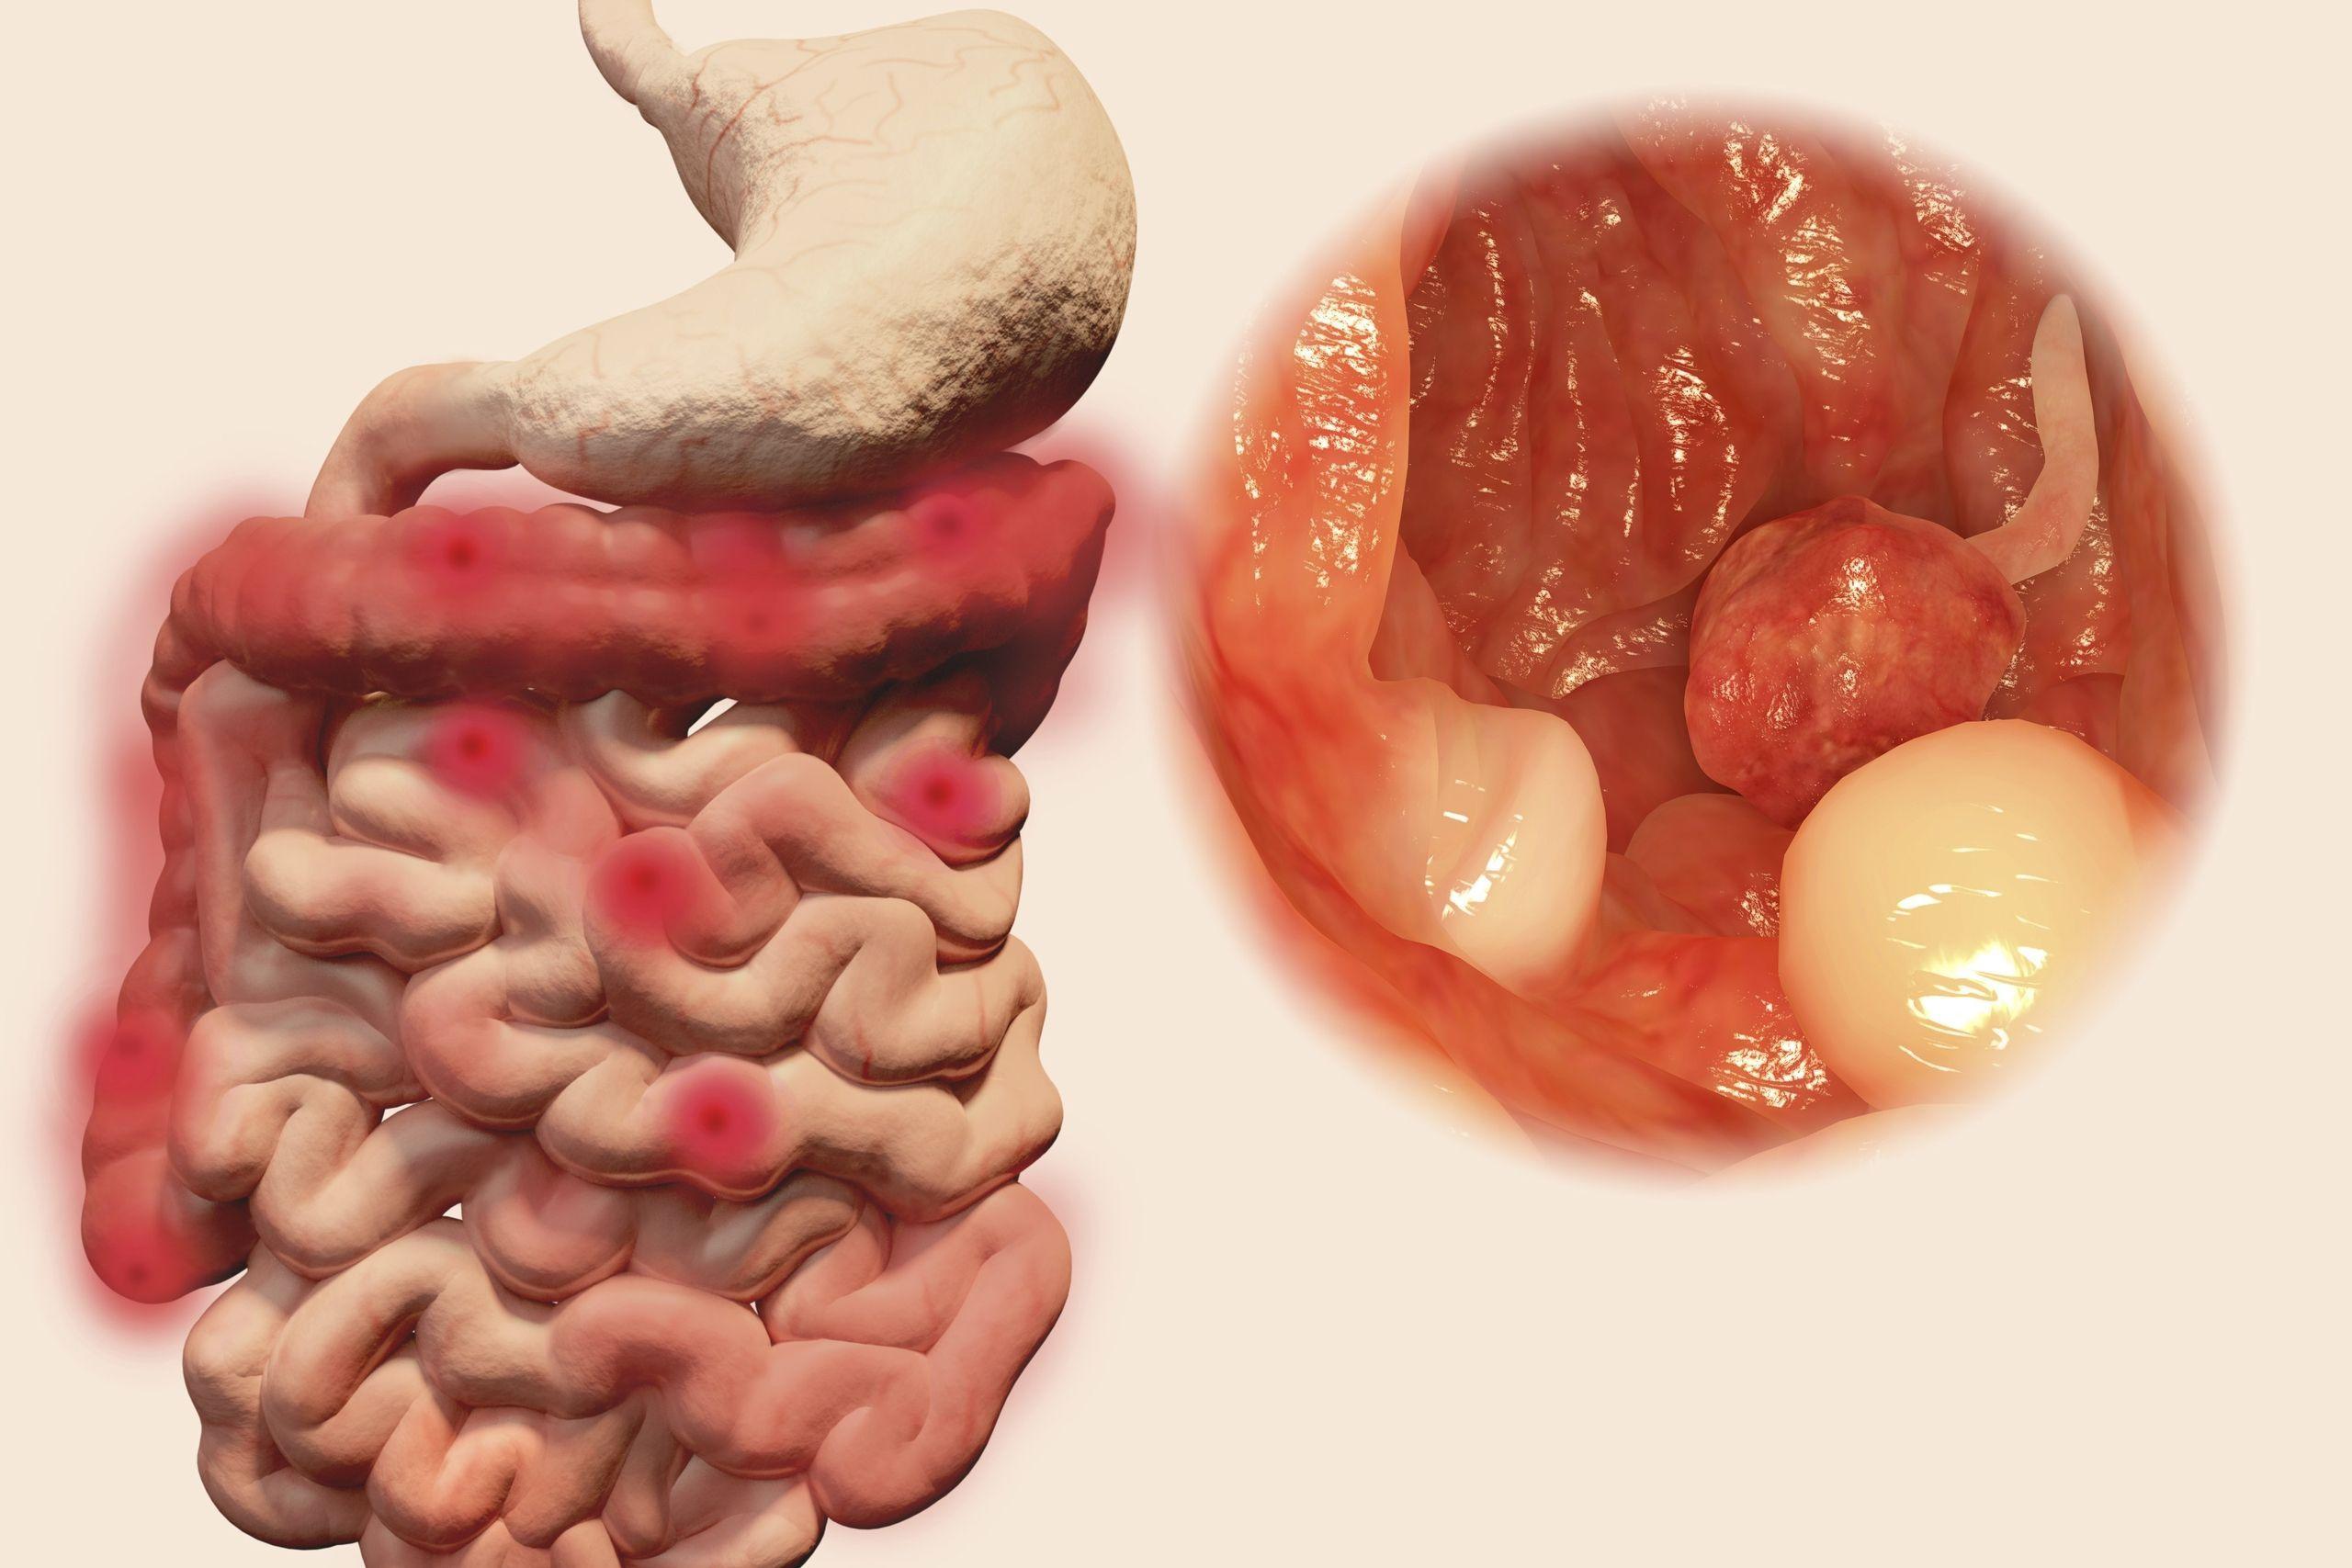 cancer colon droit pronostic human papillomavirus infection dysplasia